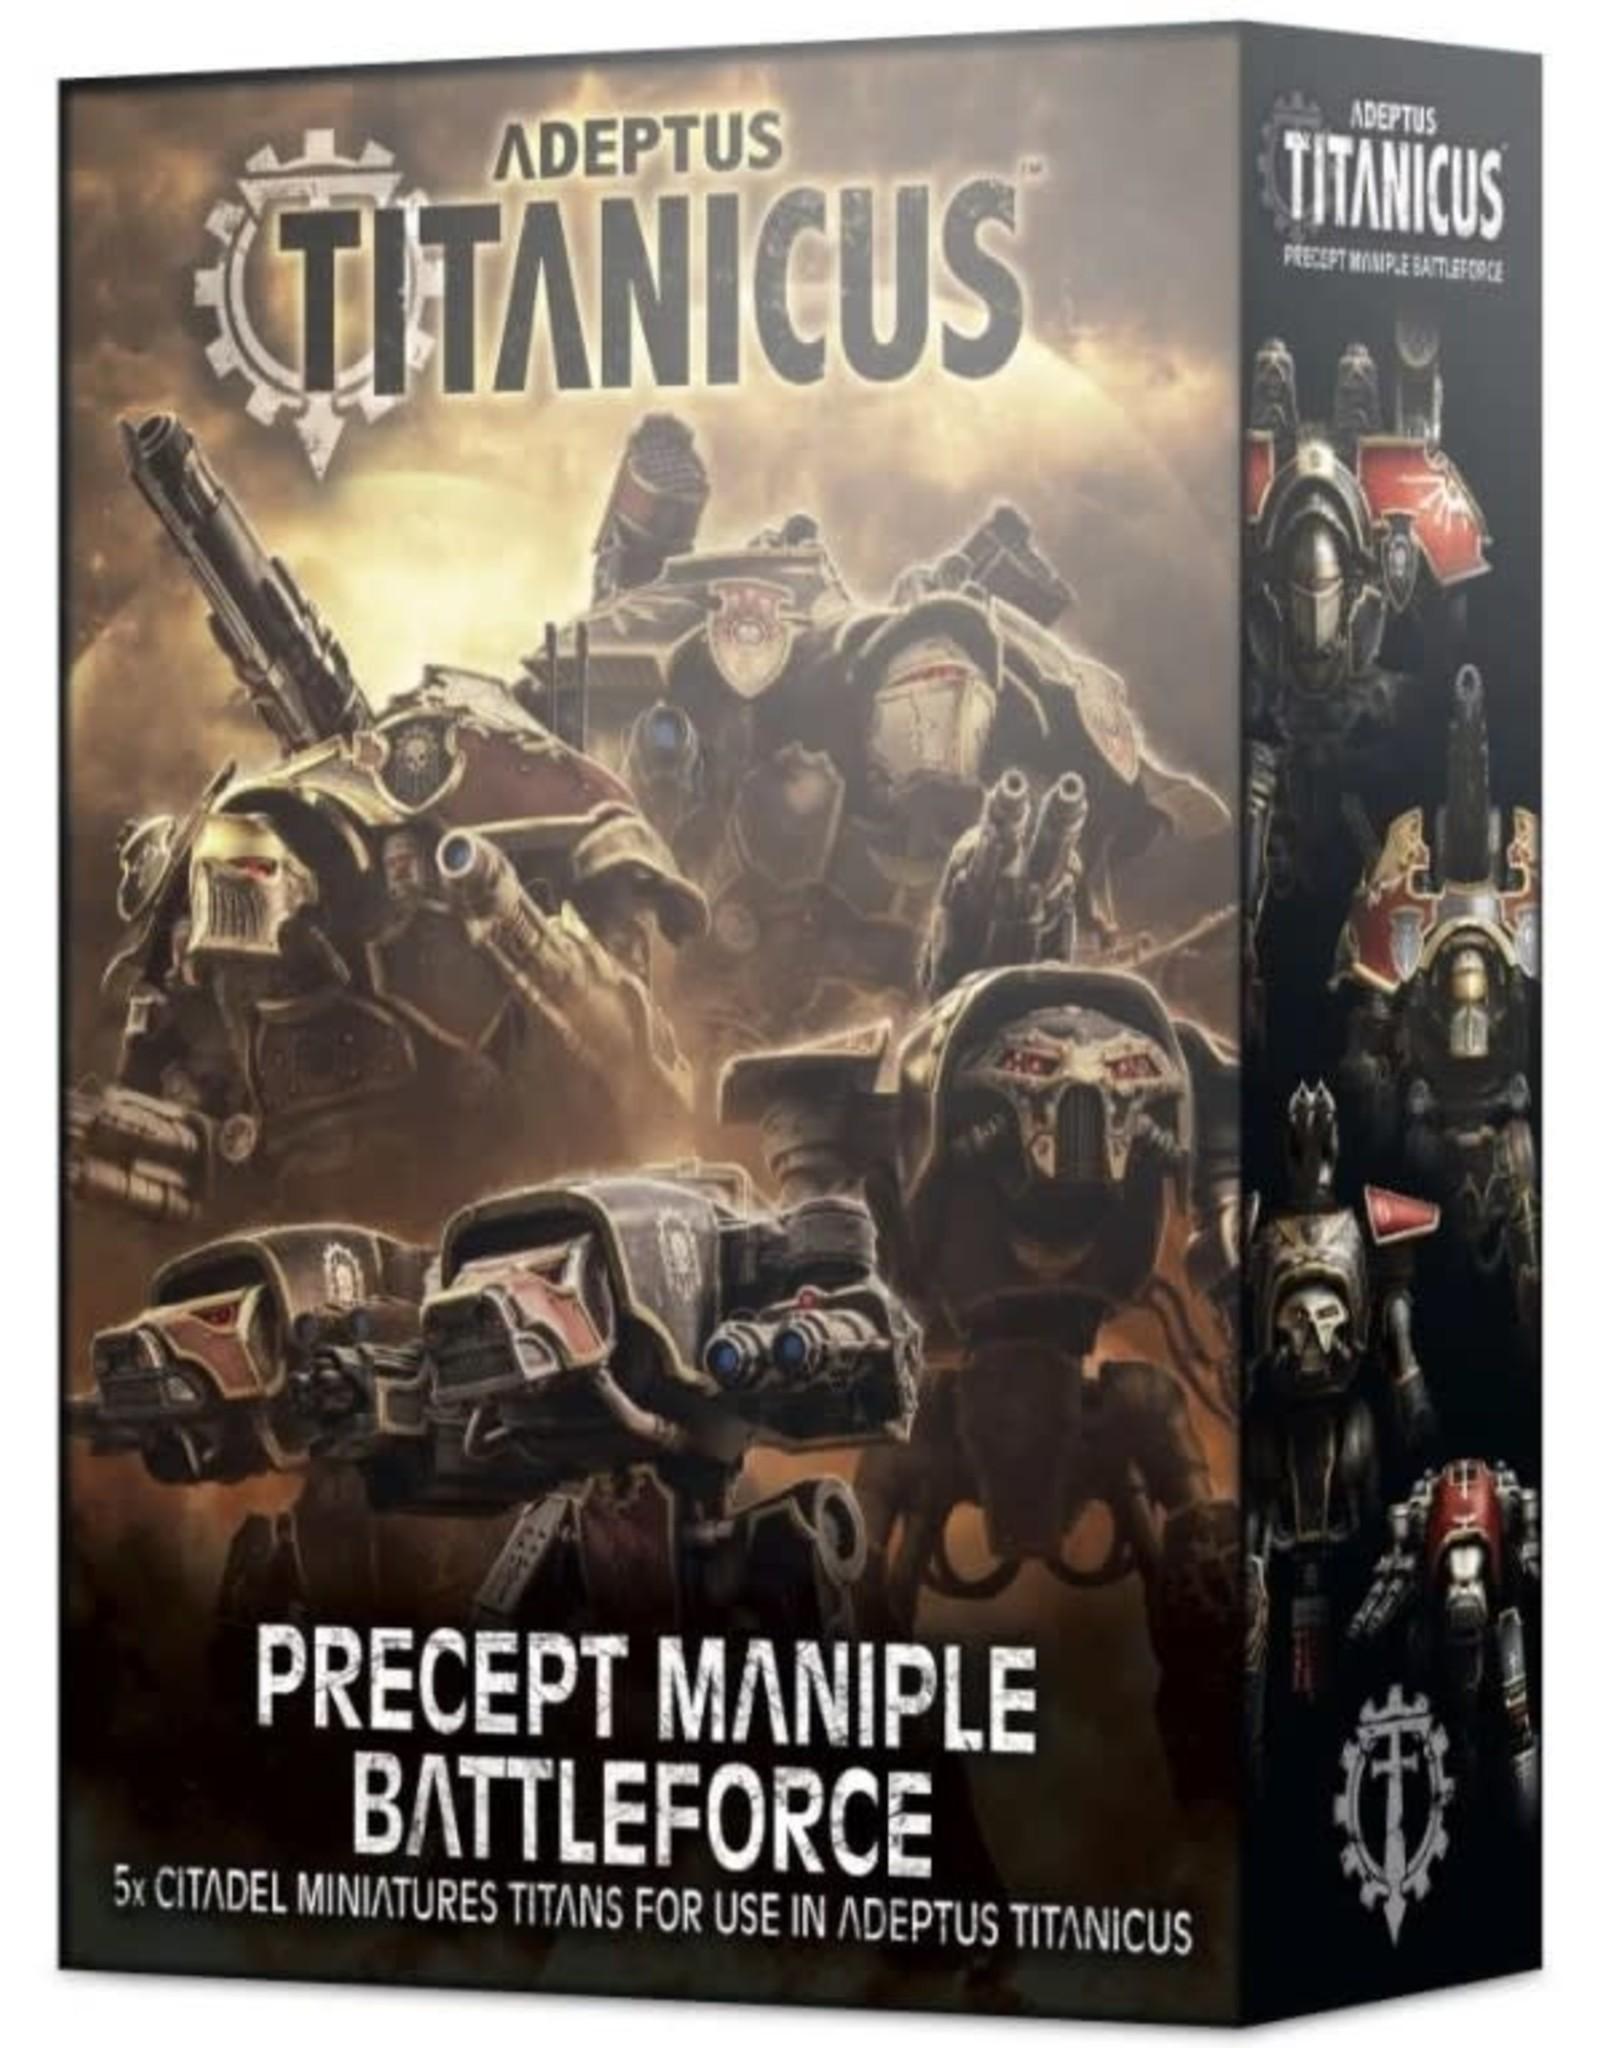 Games Workshop Adeptus Titanicus: Precept Maniple Battleforce